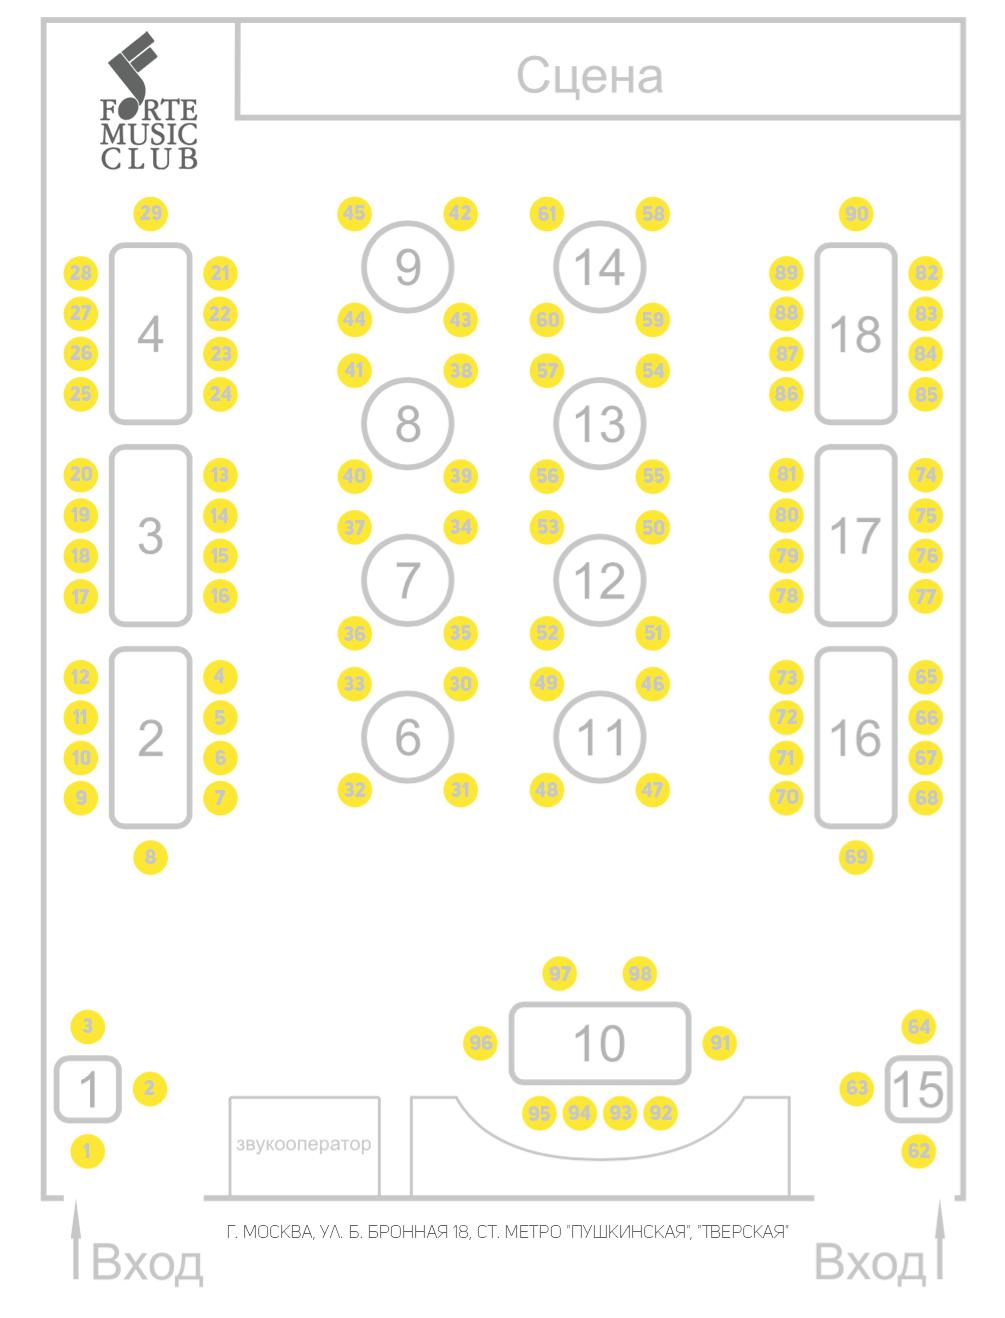 Схема зала Арт-клуб FORTE